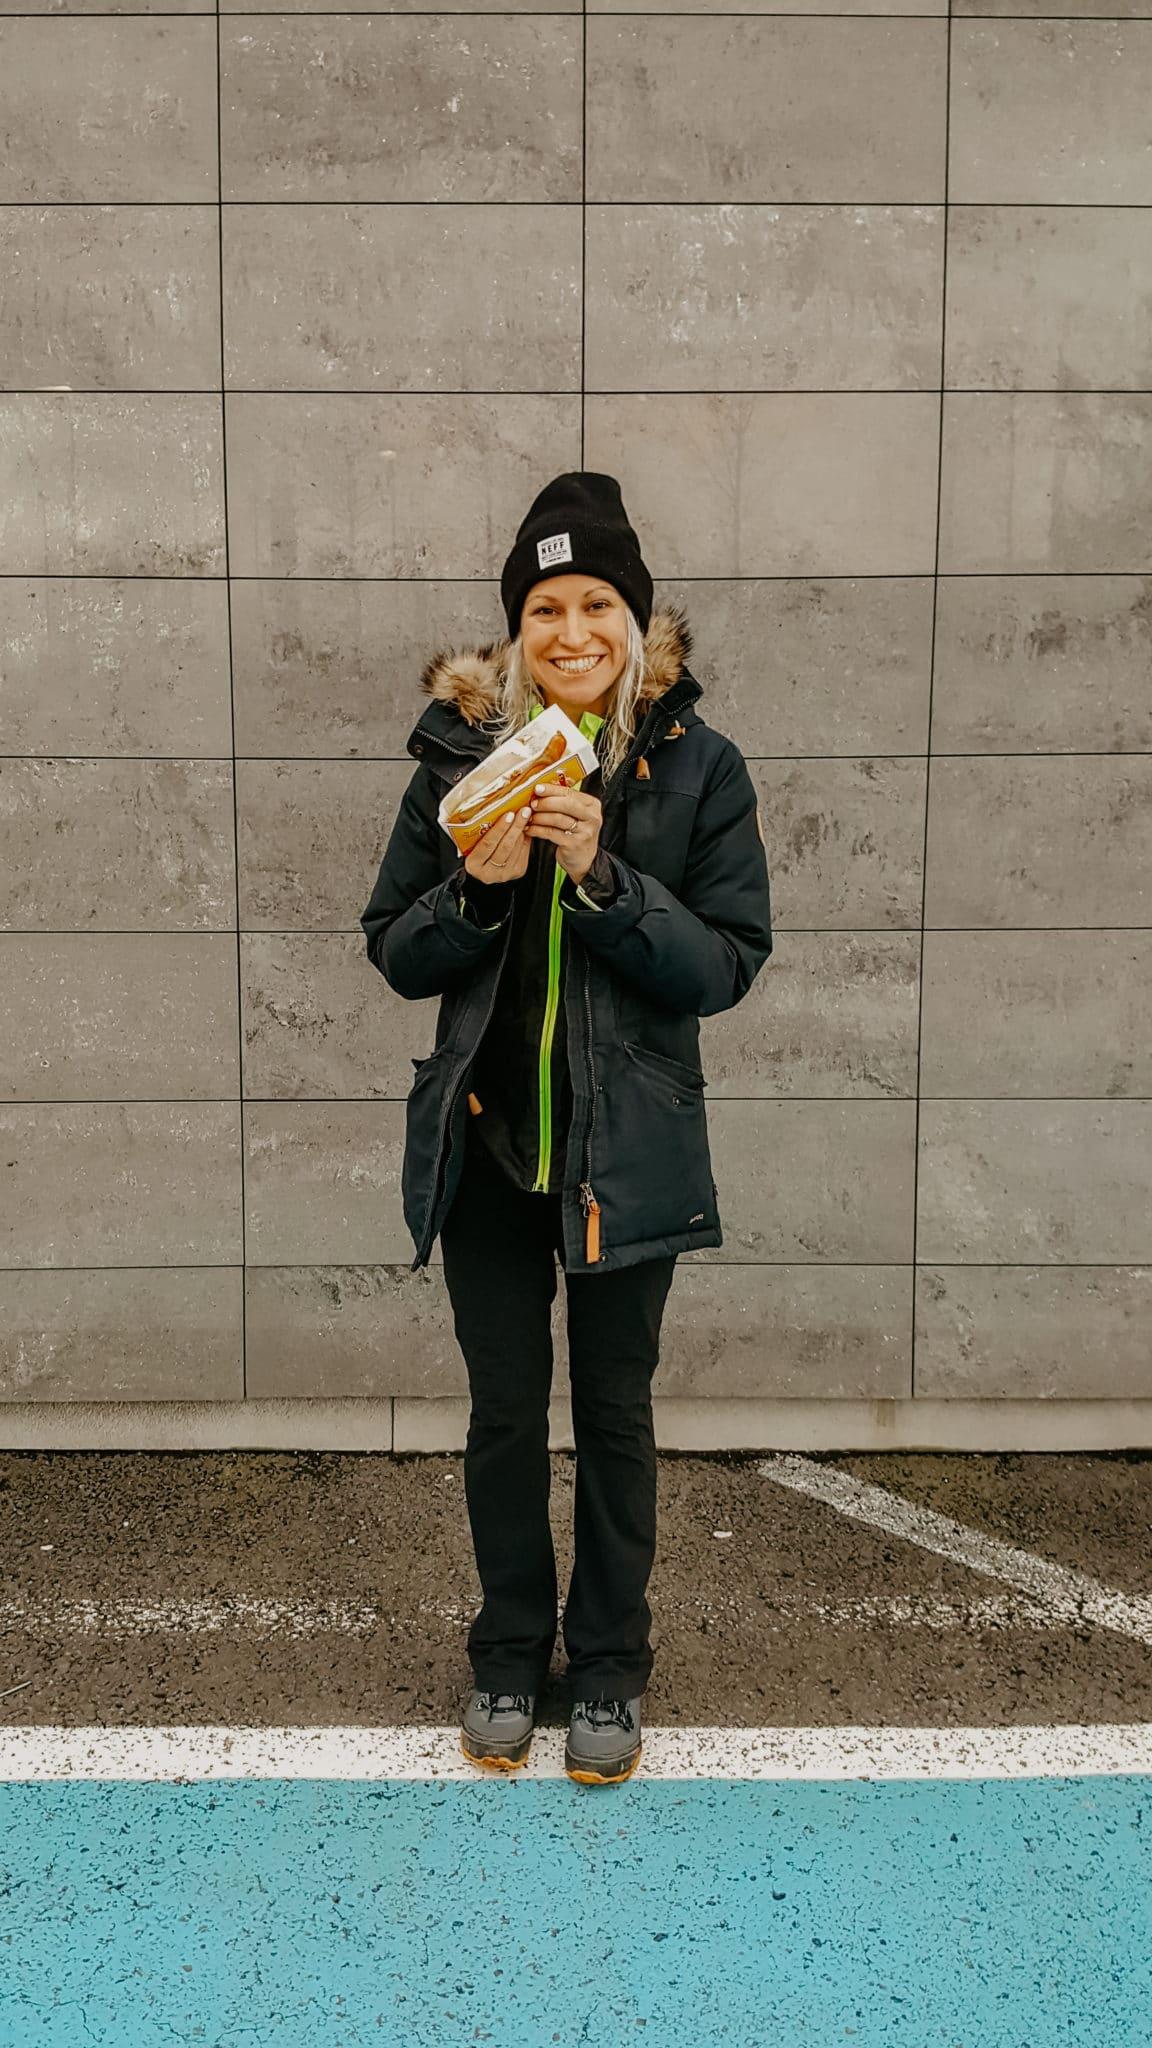 Icelandic hotdog